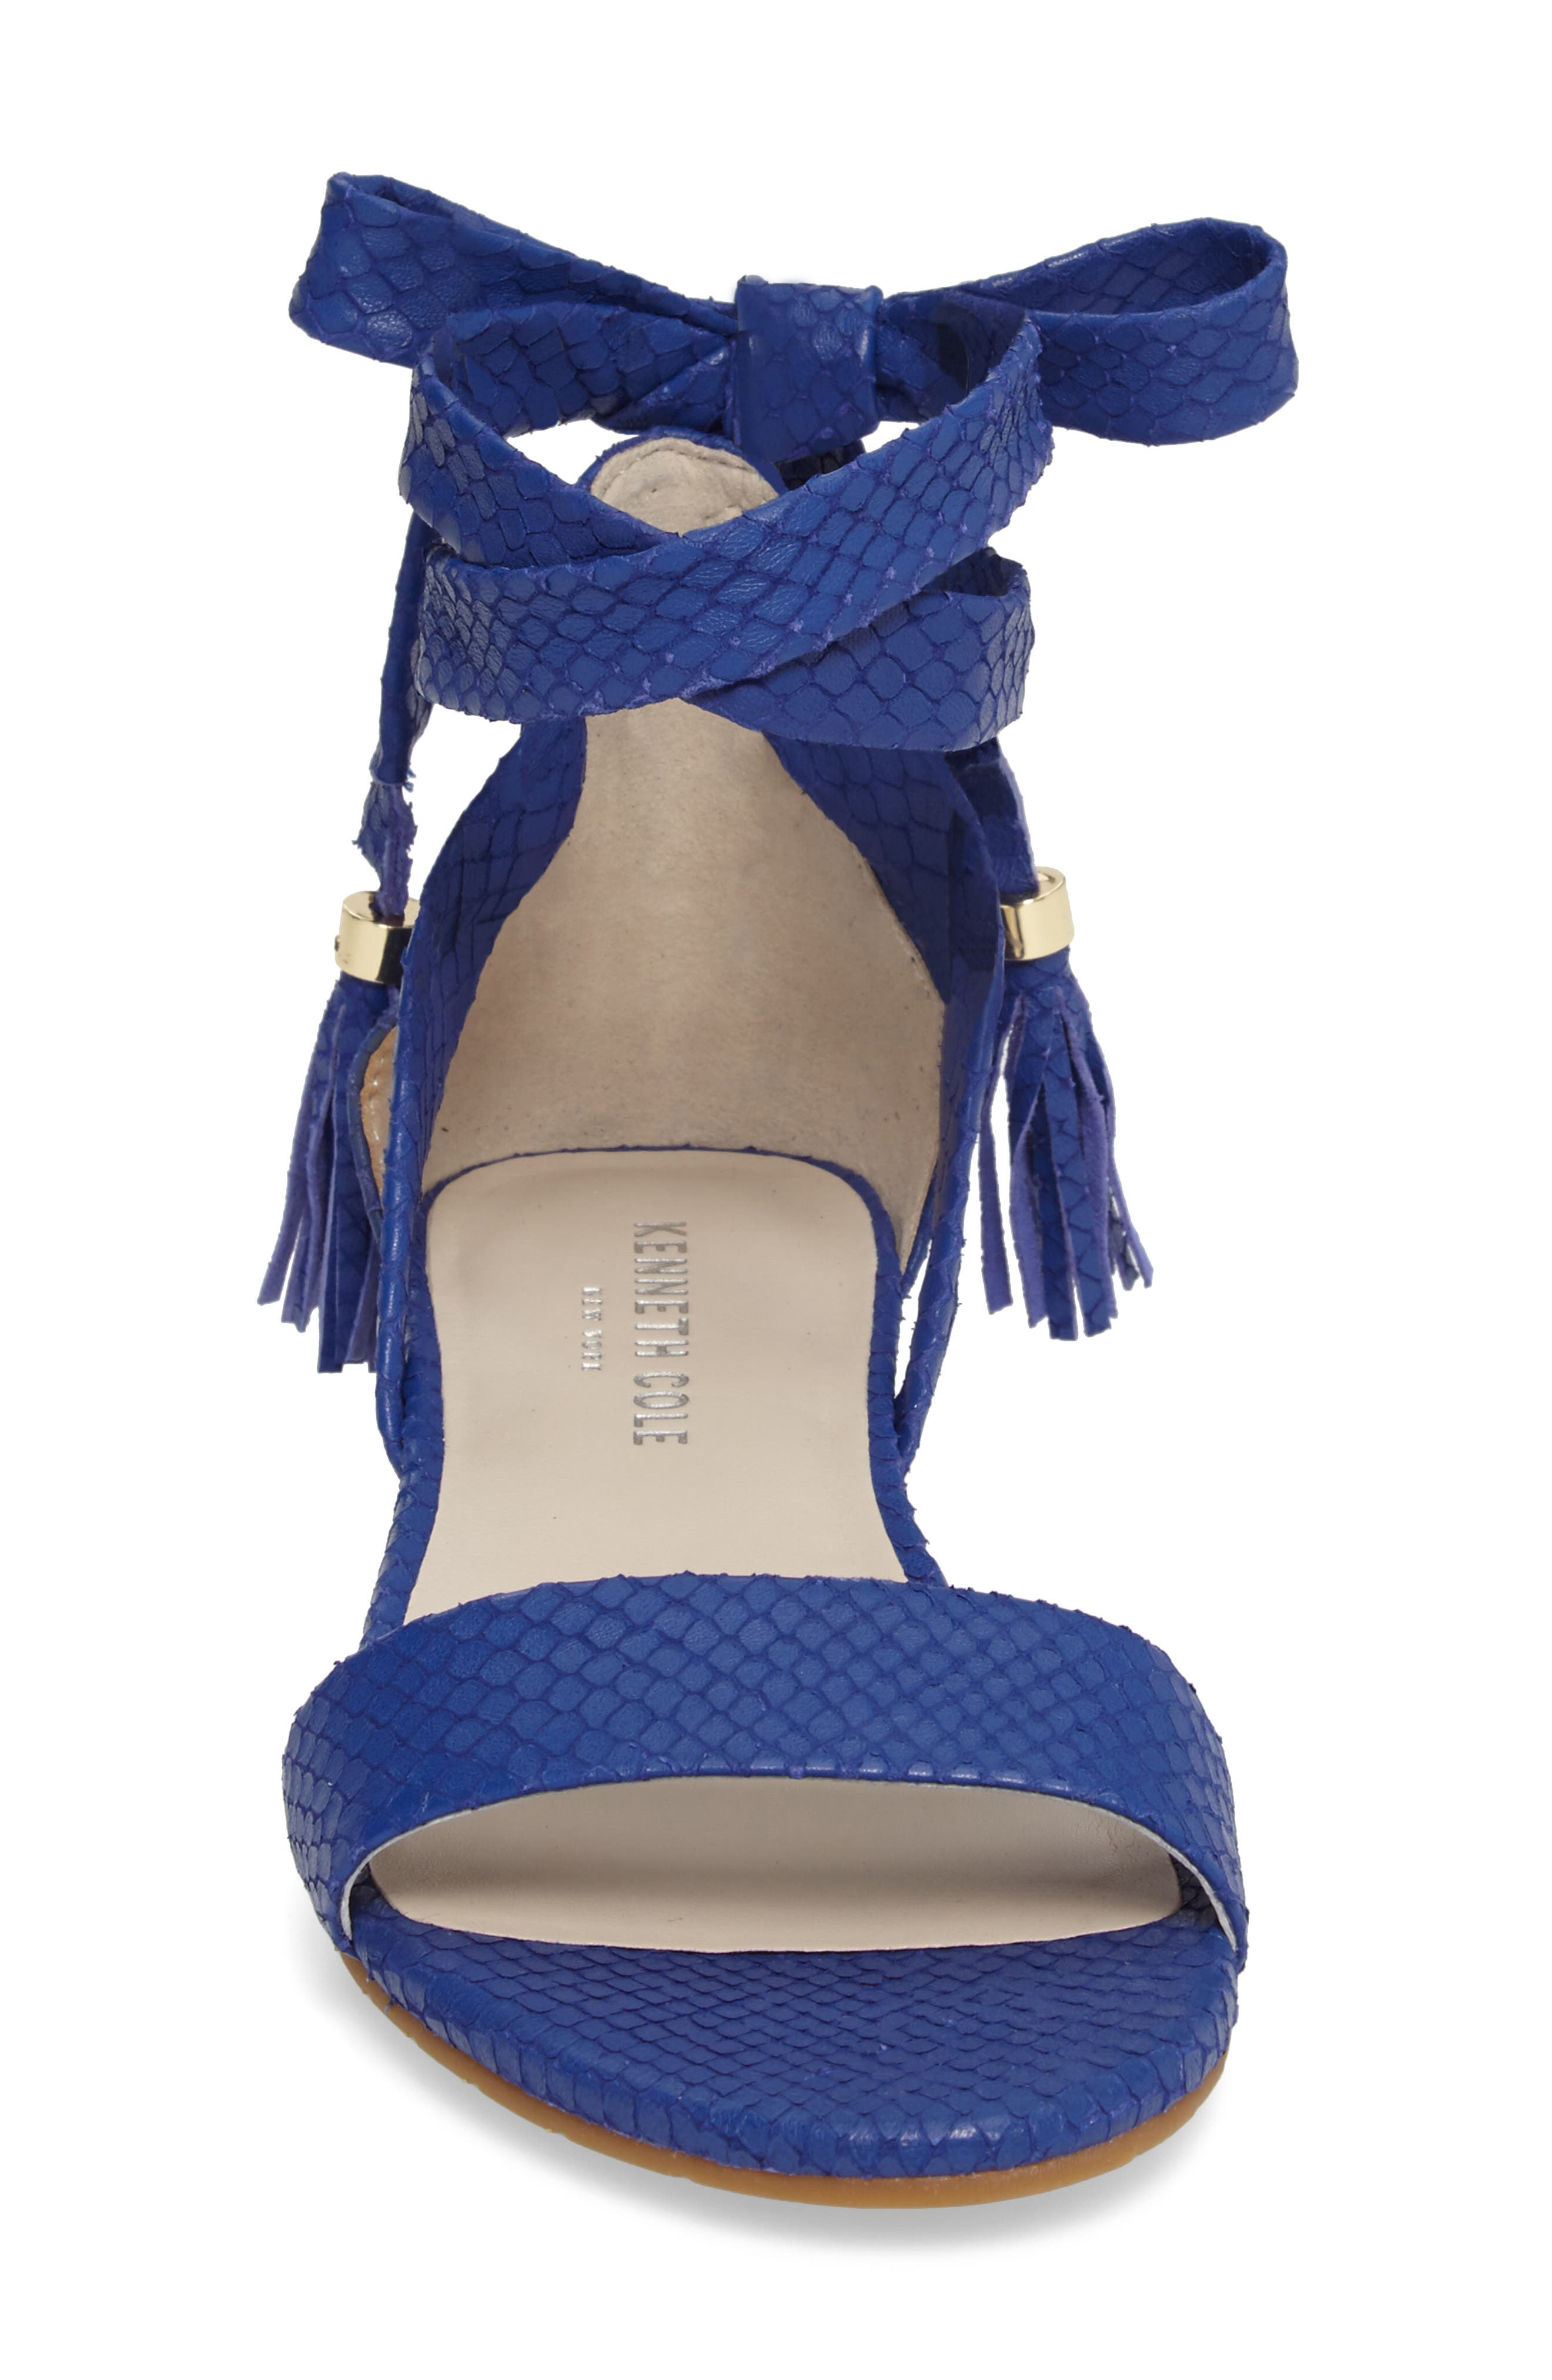 Valen Tassel Lace-Up Sandal,                             Alternate thumbnail 51, color,